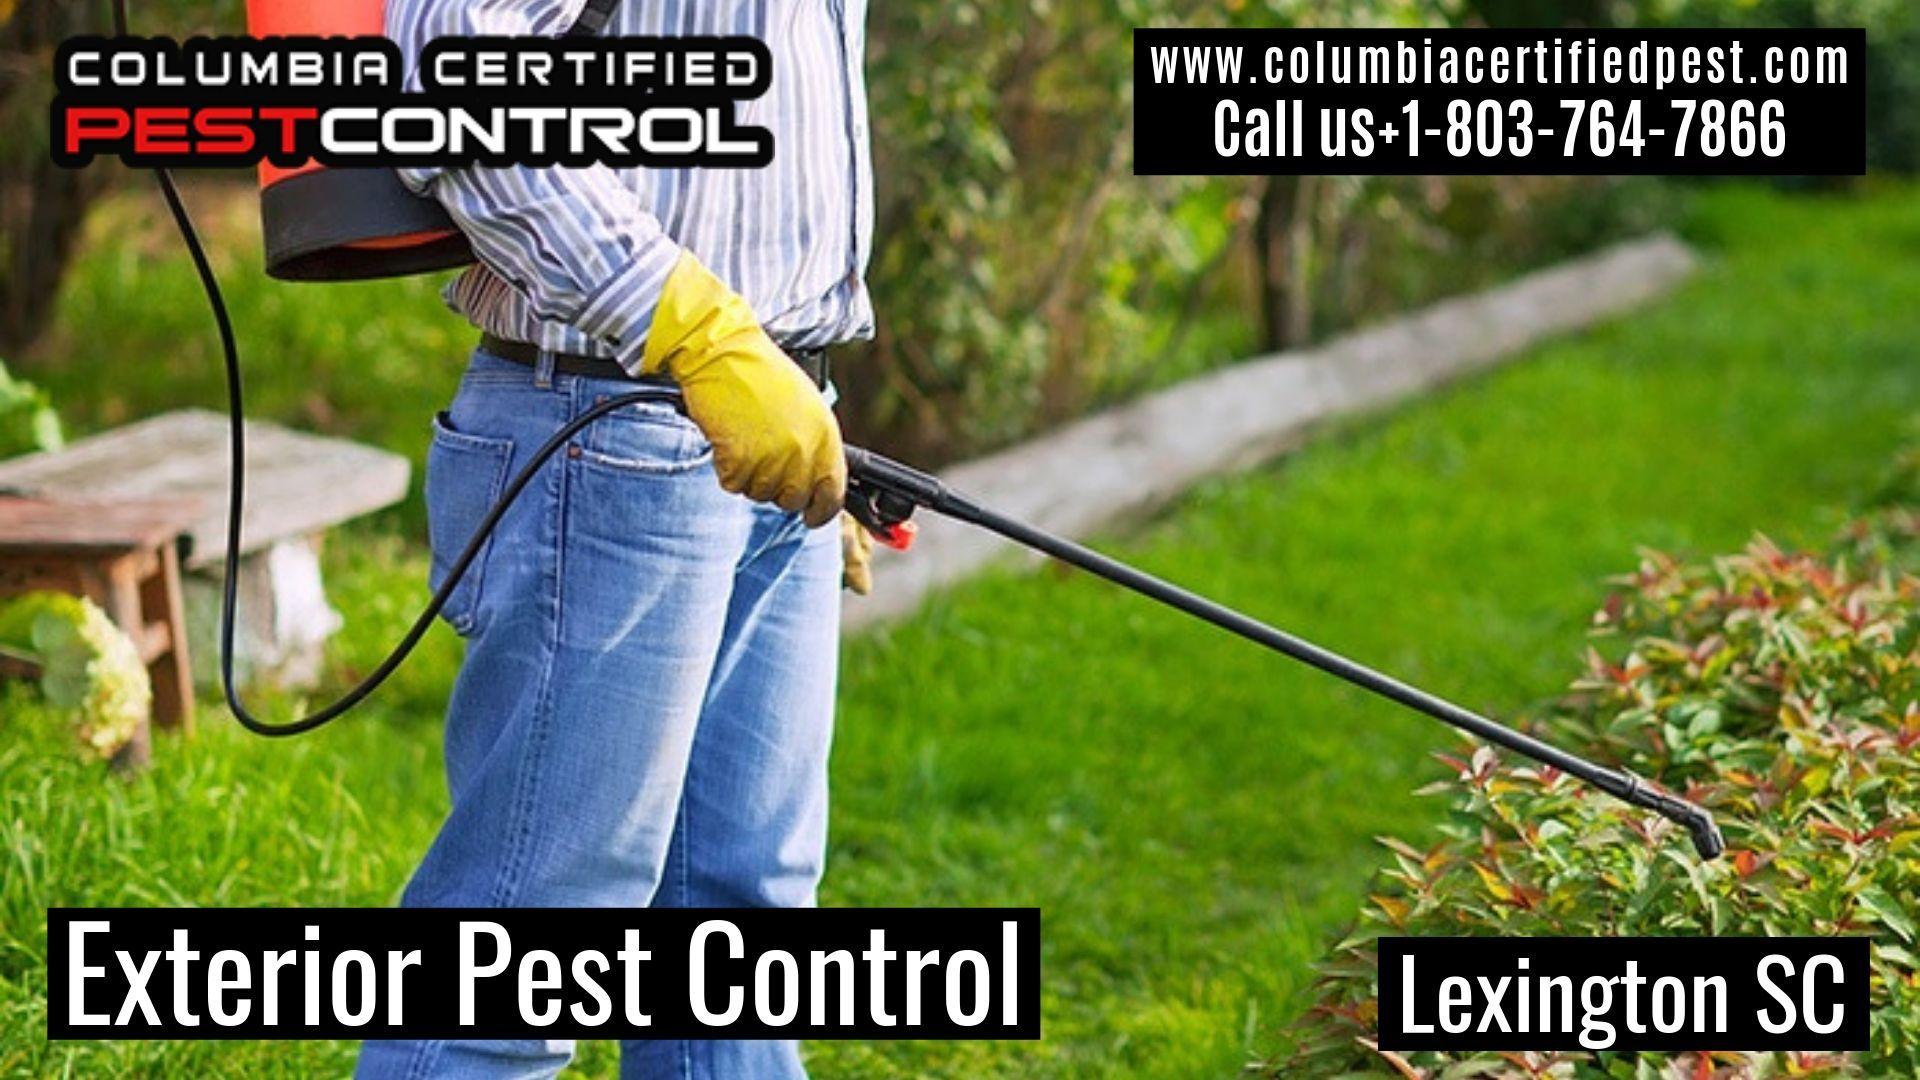 Home Pest Control Columbia Sc Pest Control Pest Infestation Pest Control Services